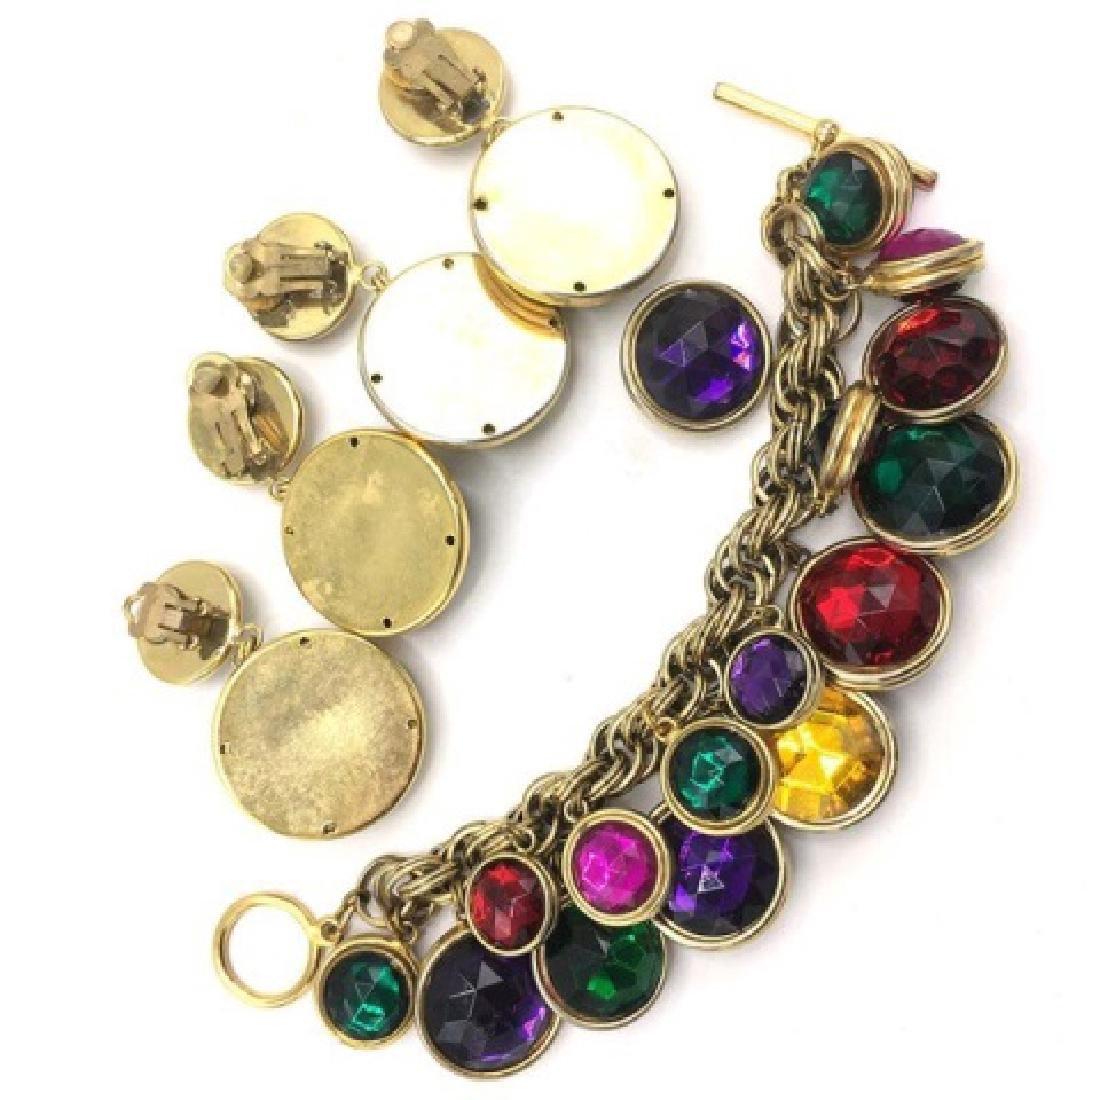 Vintage 1980s Costume Gold Tone Costume Jewelry - 2